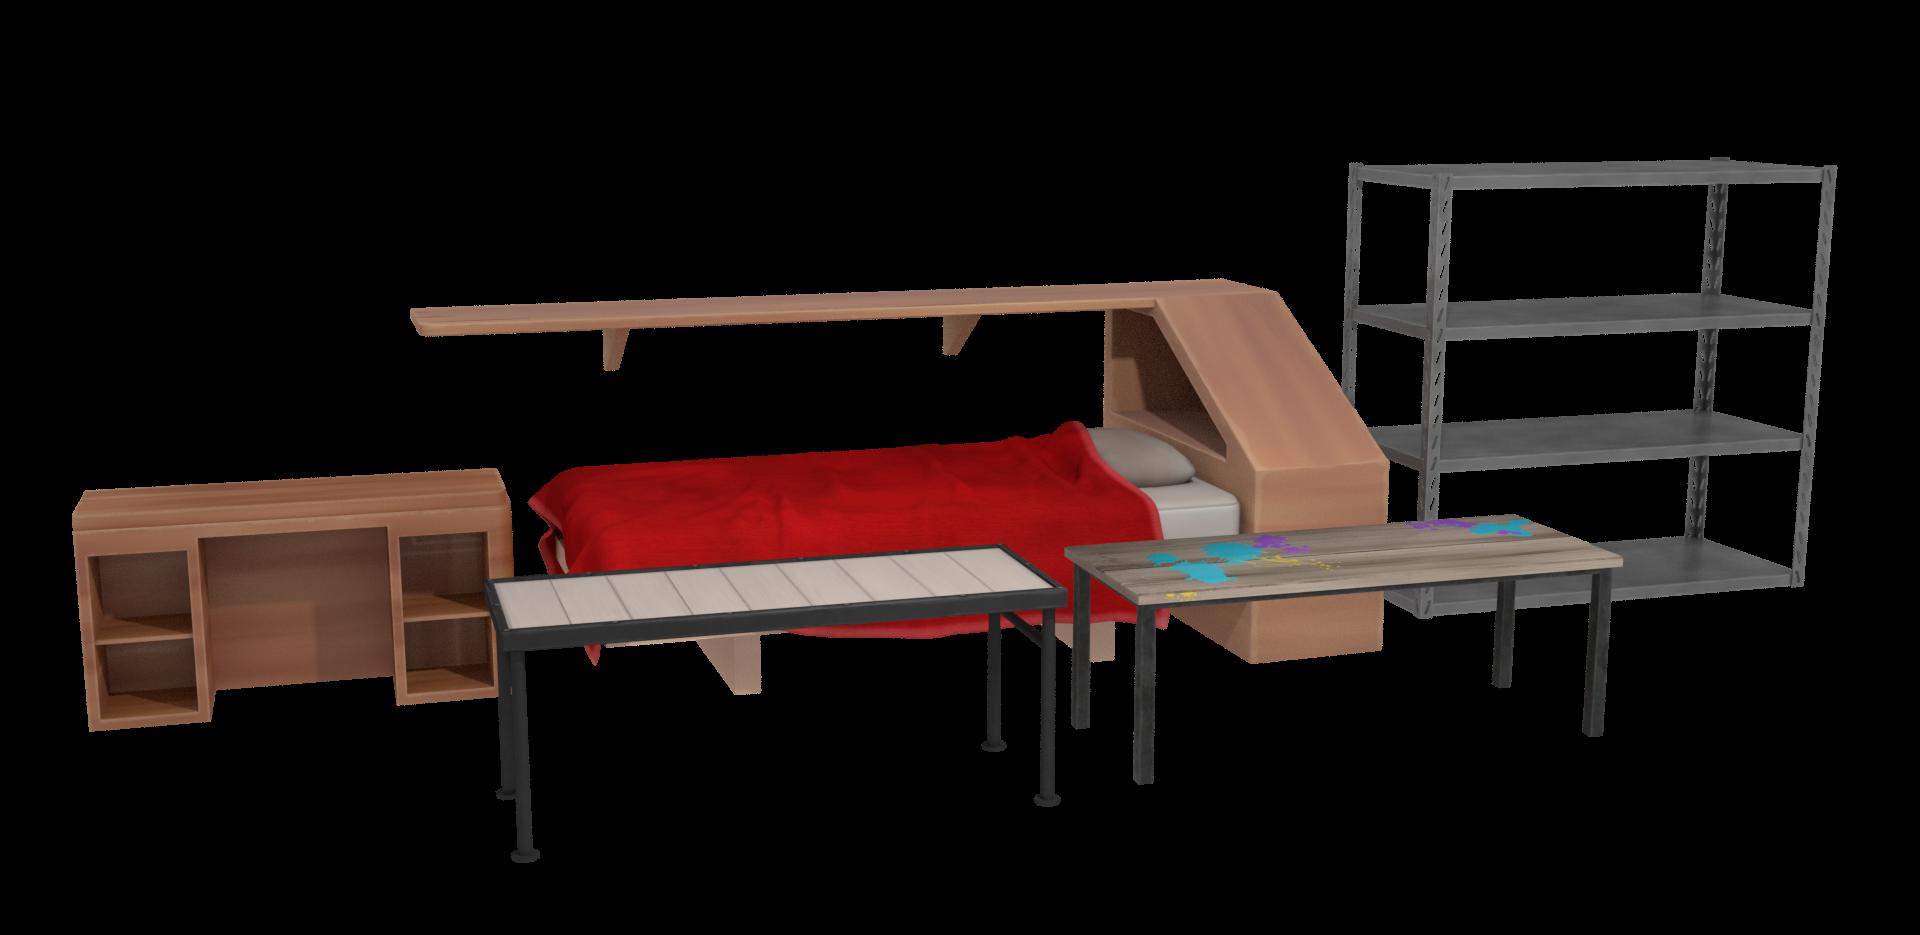 furnitureCompilation_transparency.png